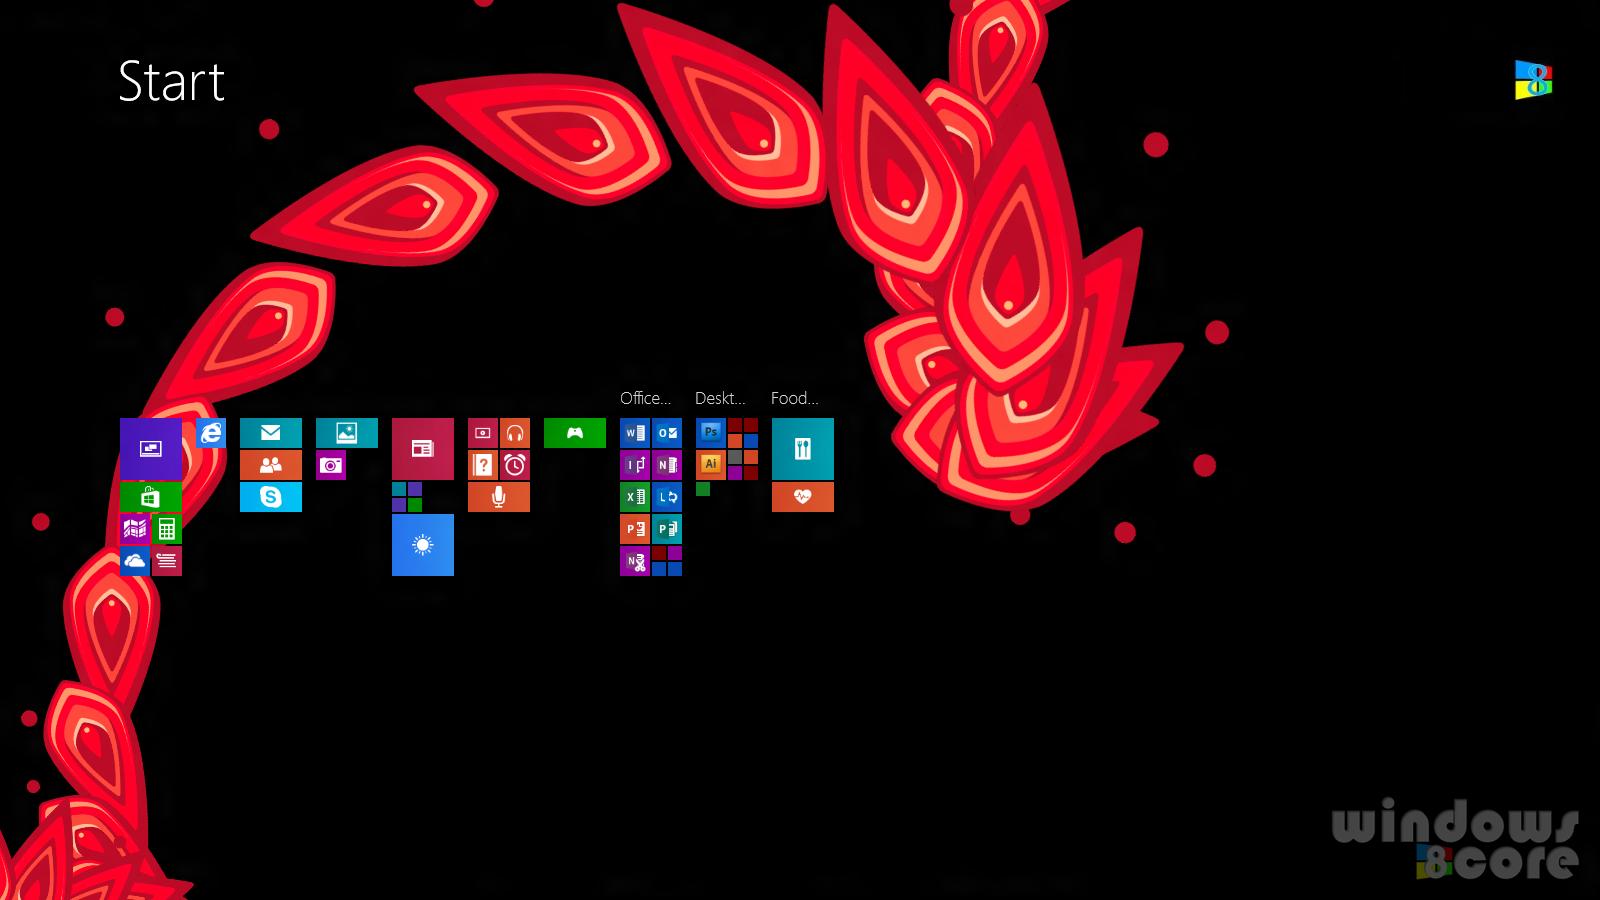 animated wallpapers for windows 8 1 wallpapersafari